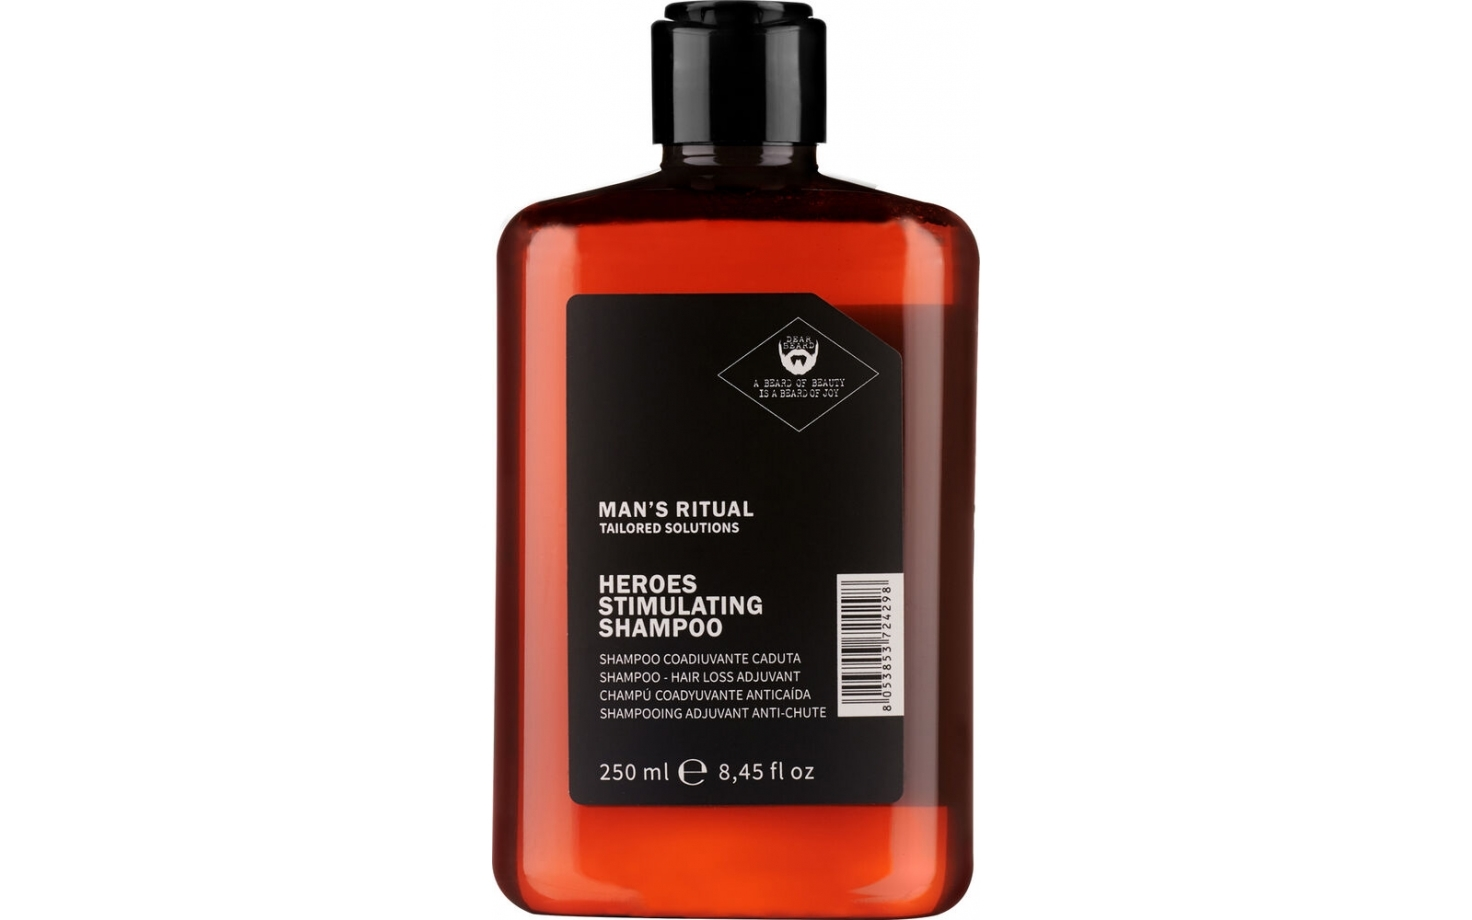 Dear Beard Man's Ritual Heroes Stimmulierendes Shampoo